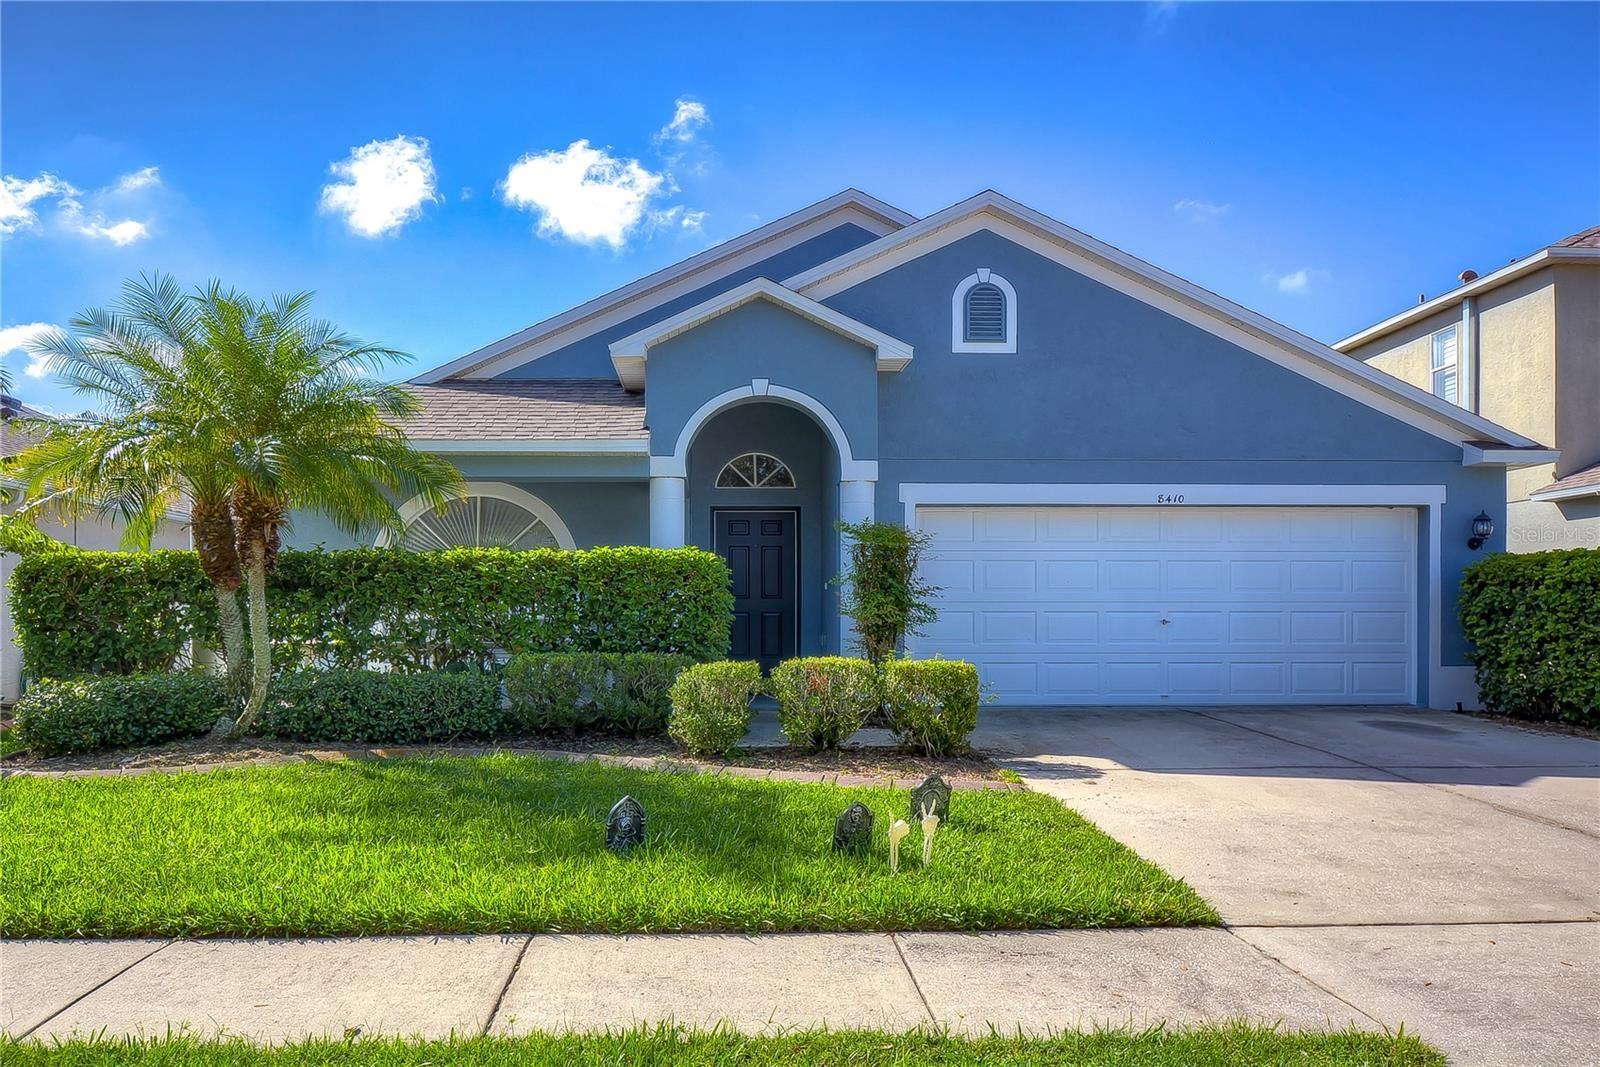 8410 CANTERBURY LAKE BOULEVARD, Tampa, FL 33619 - MLS#: T3335058